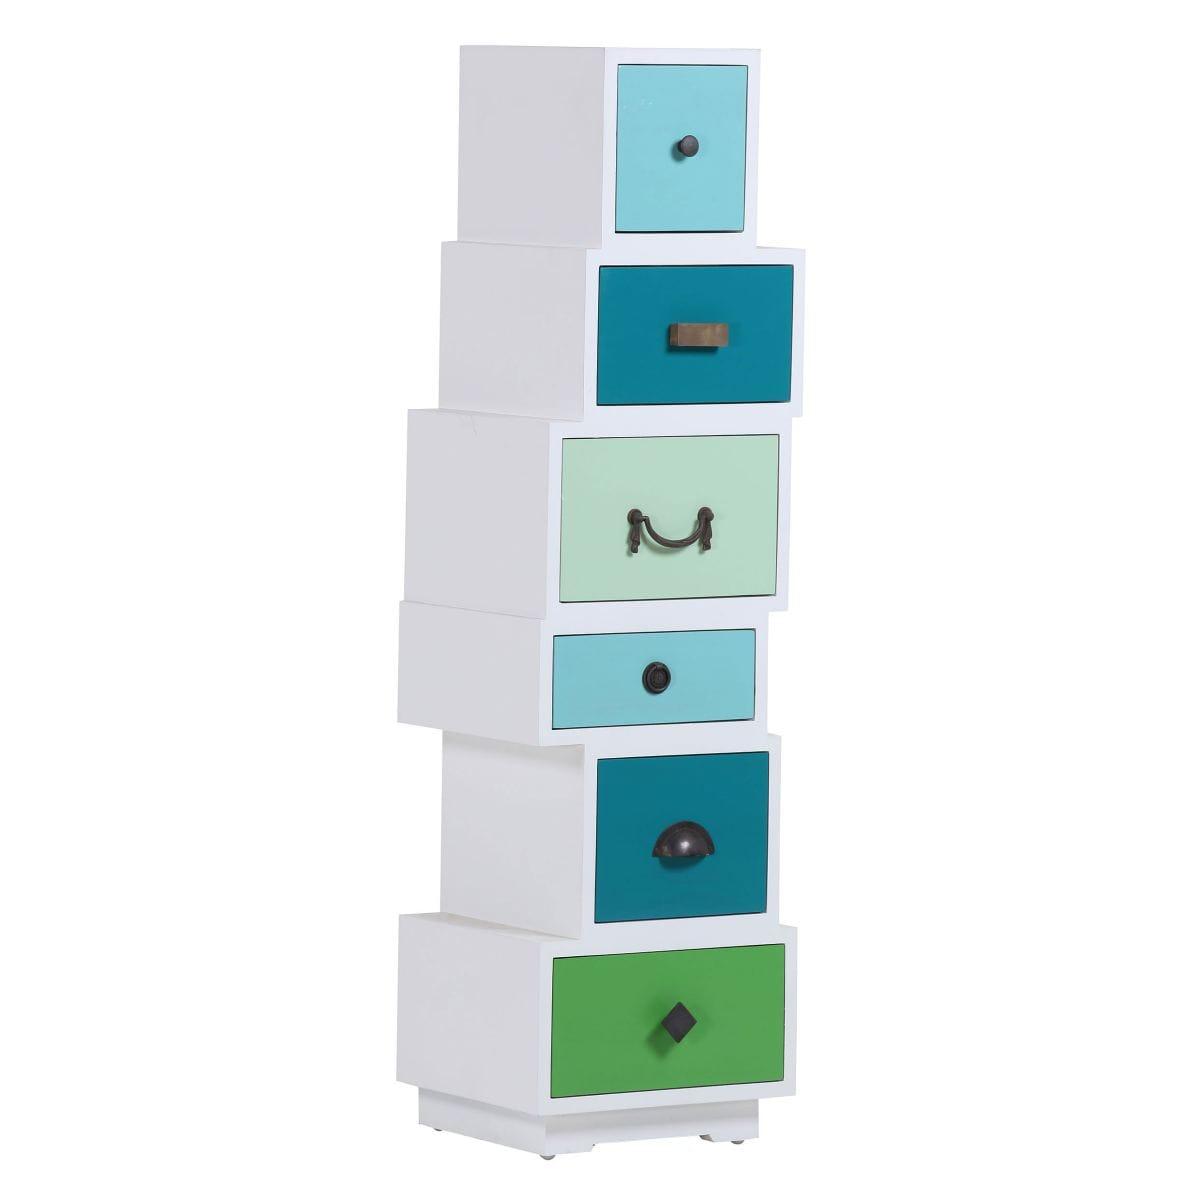 asymmetrische kommode porta porta onlineshop. Black Bedroom Furniture Sets. Home Design Ideas